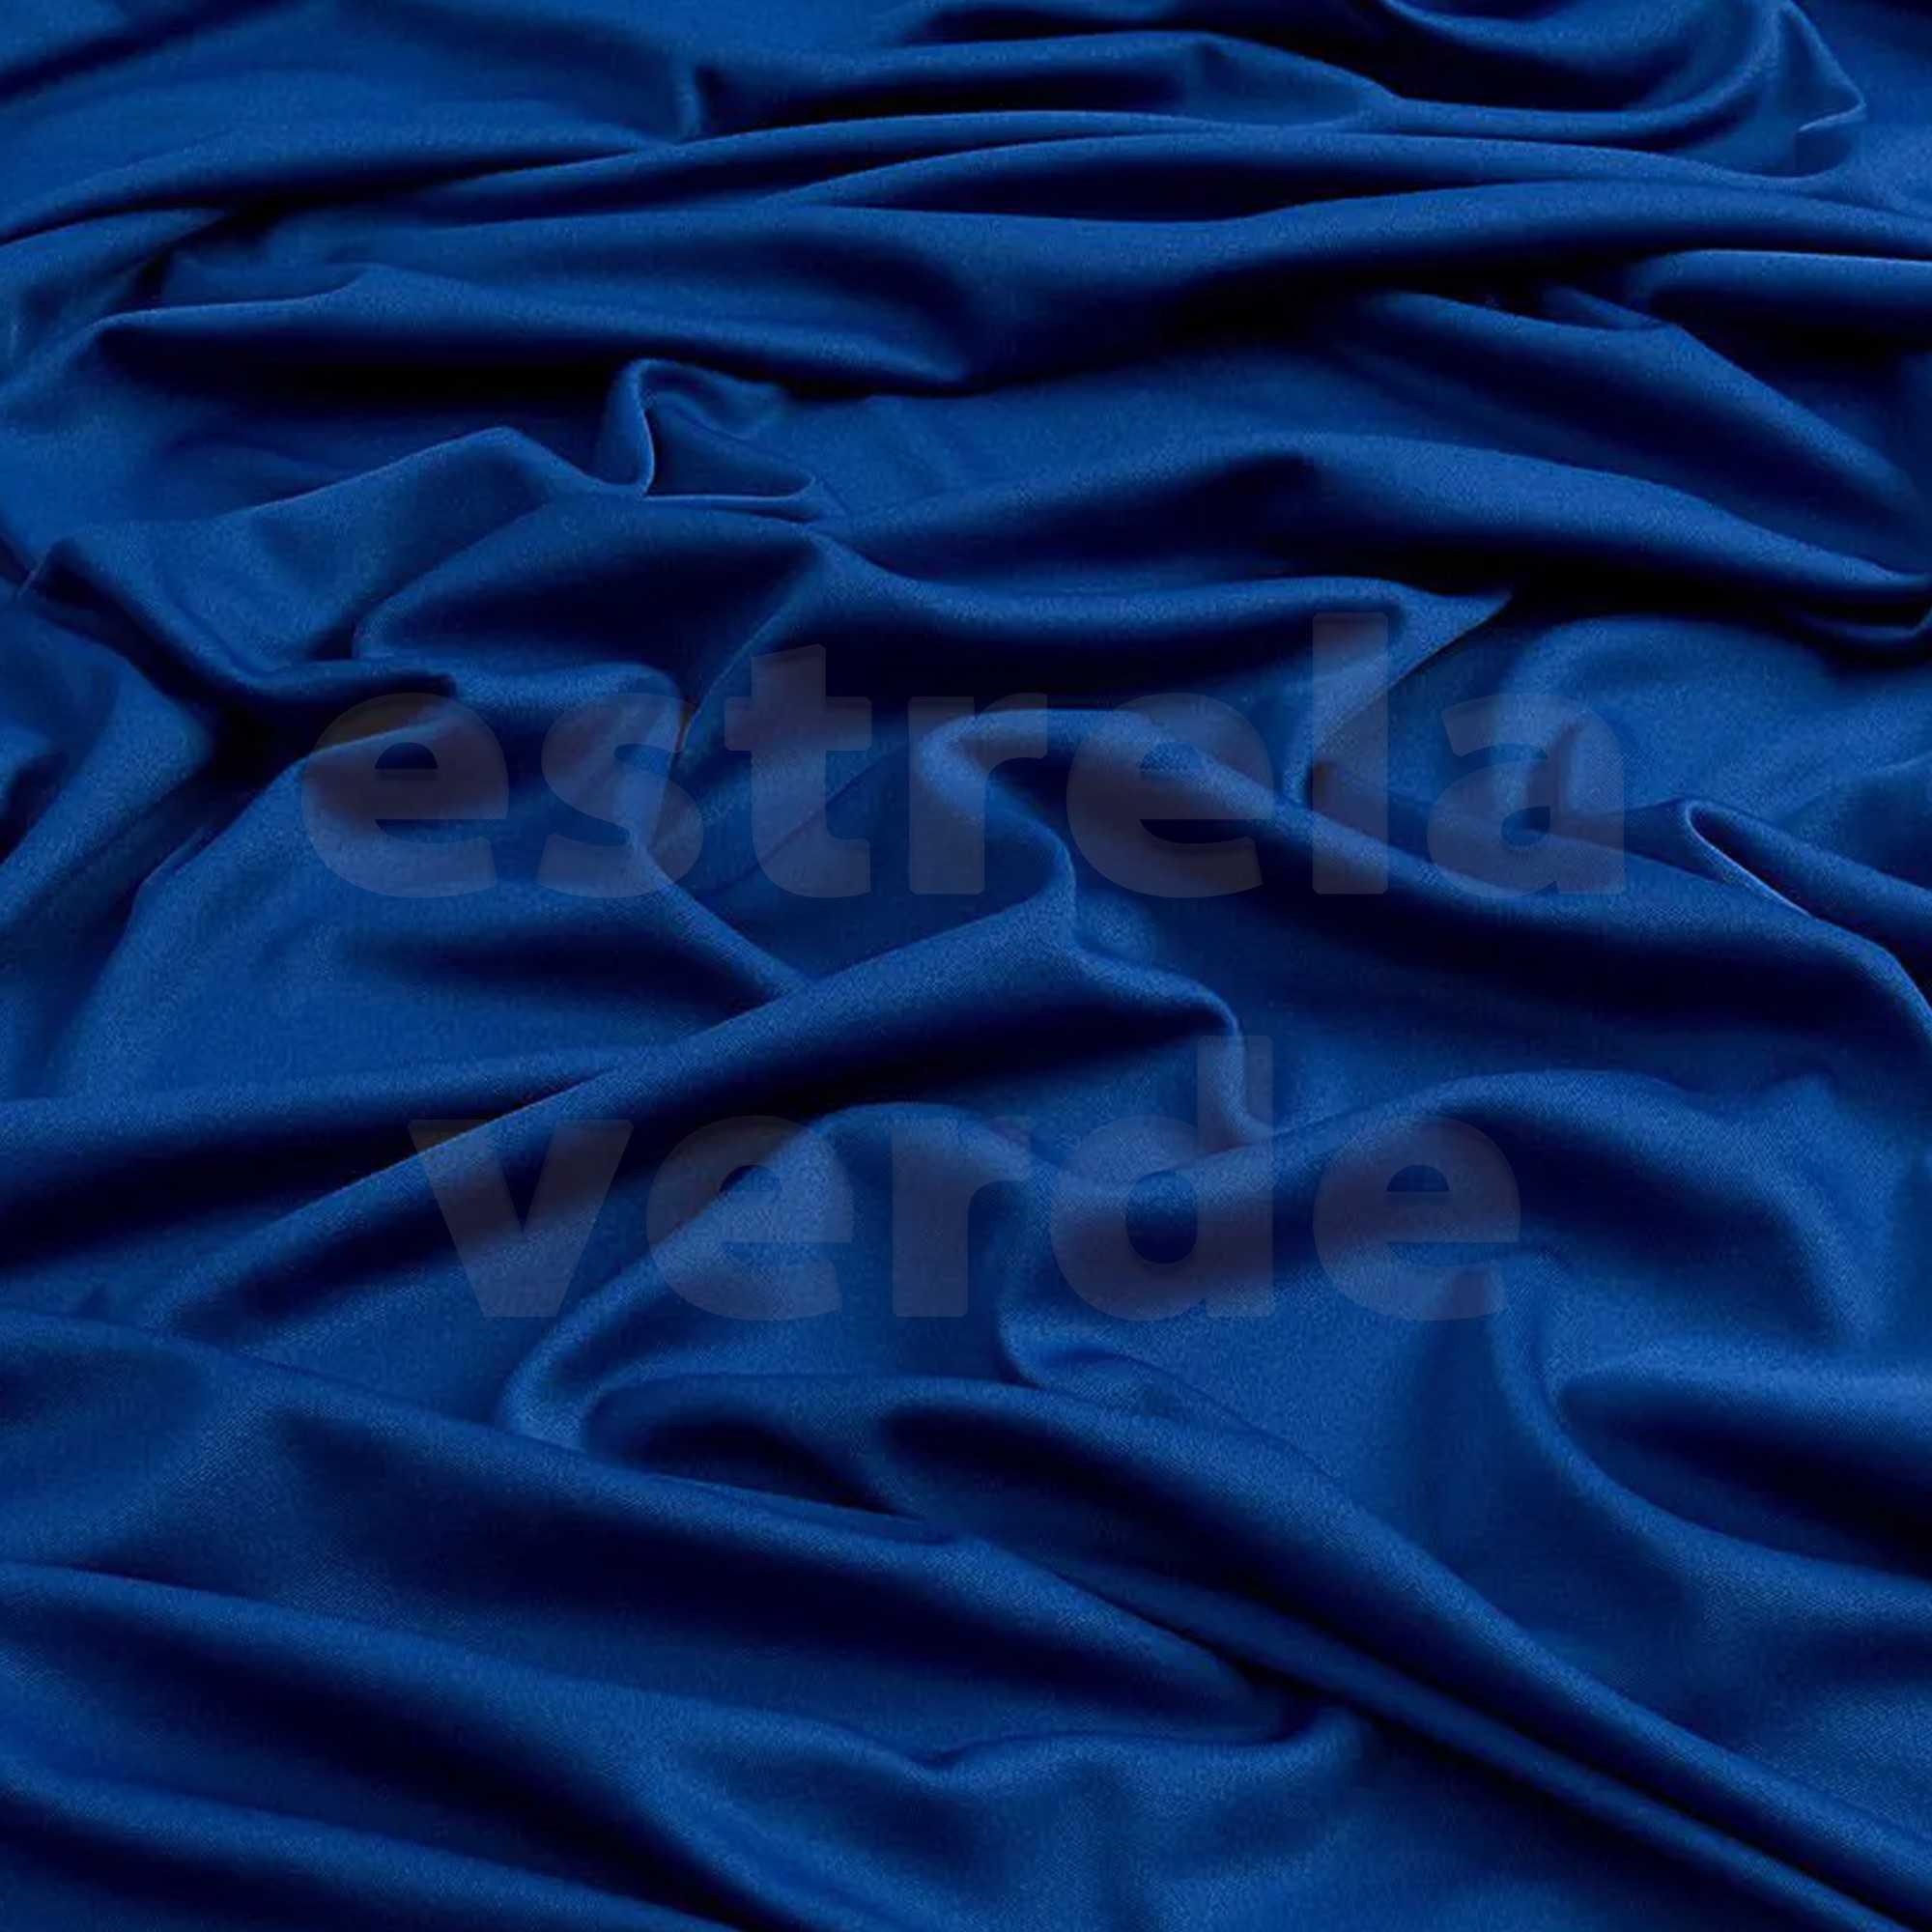 HELANCA LIGHT AZUL ROYAL 775 1,80 LARG  - Estrela Verde